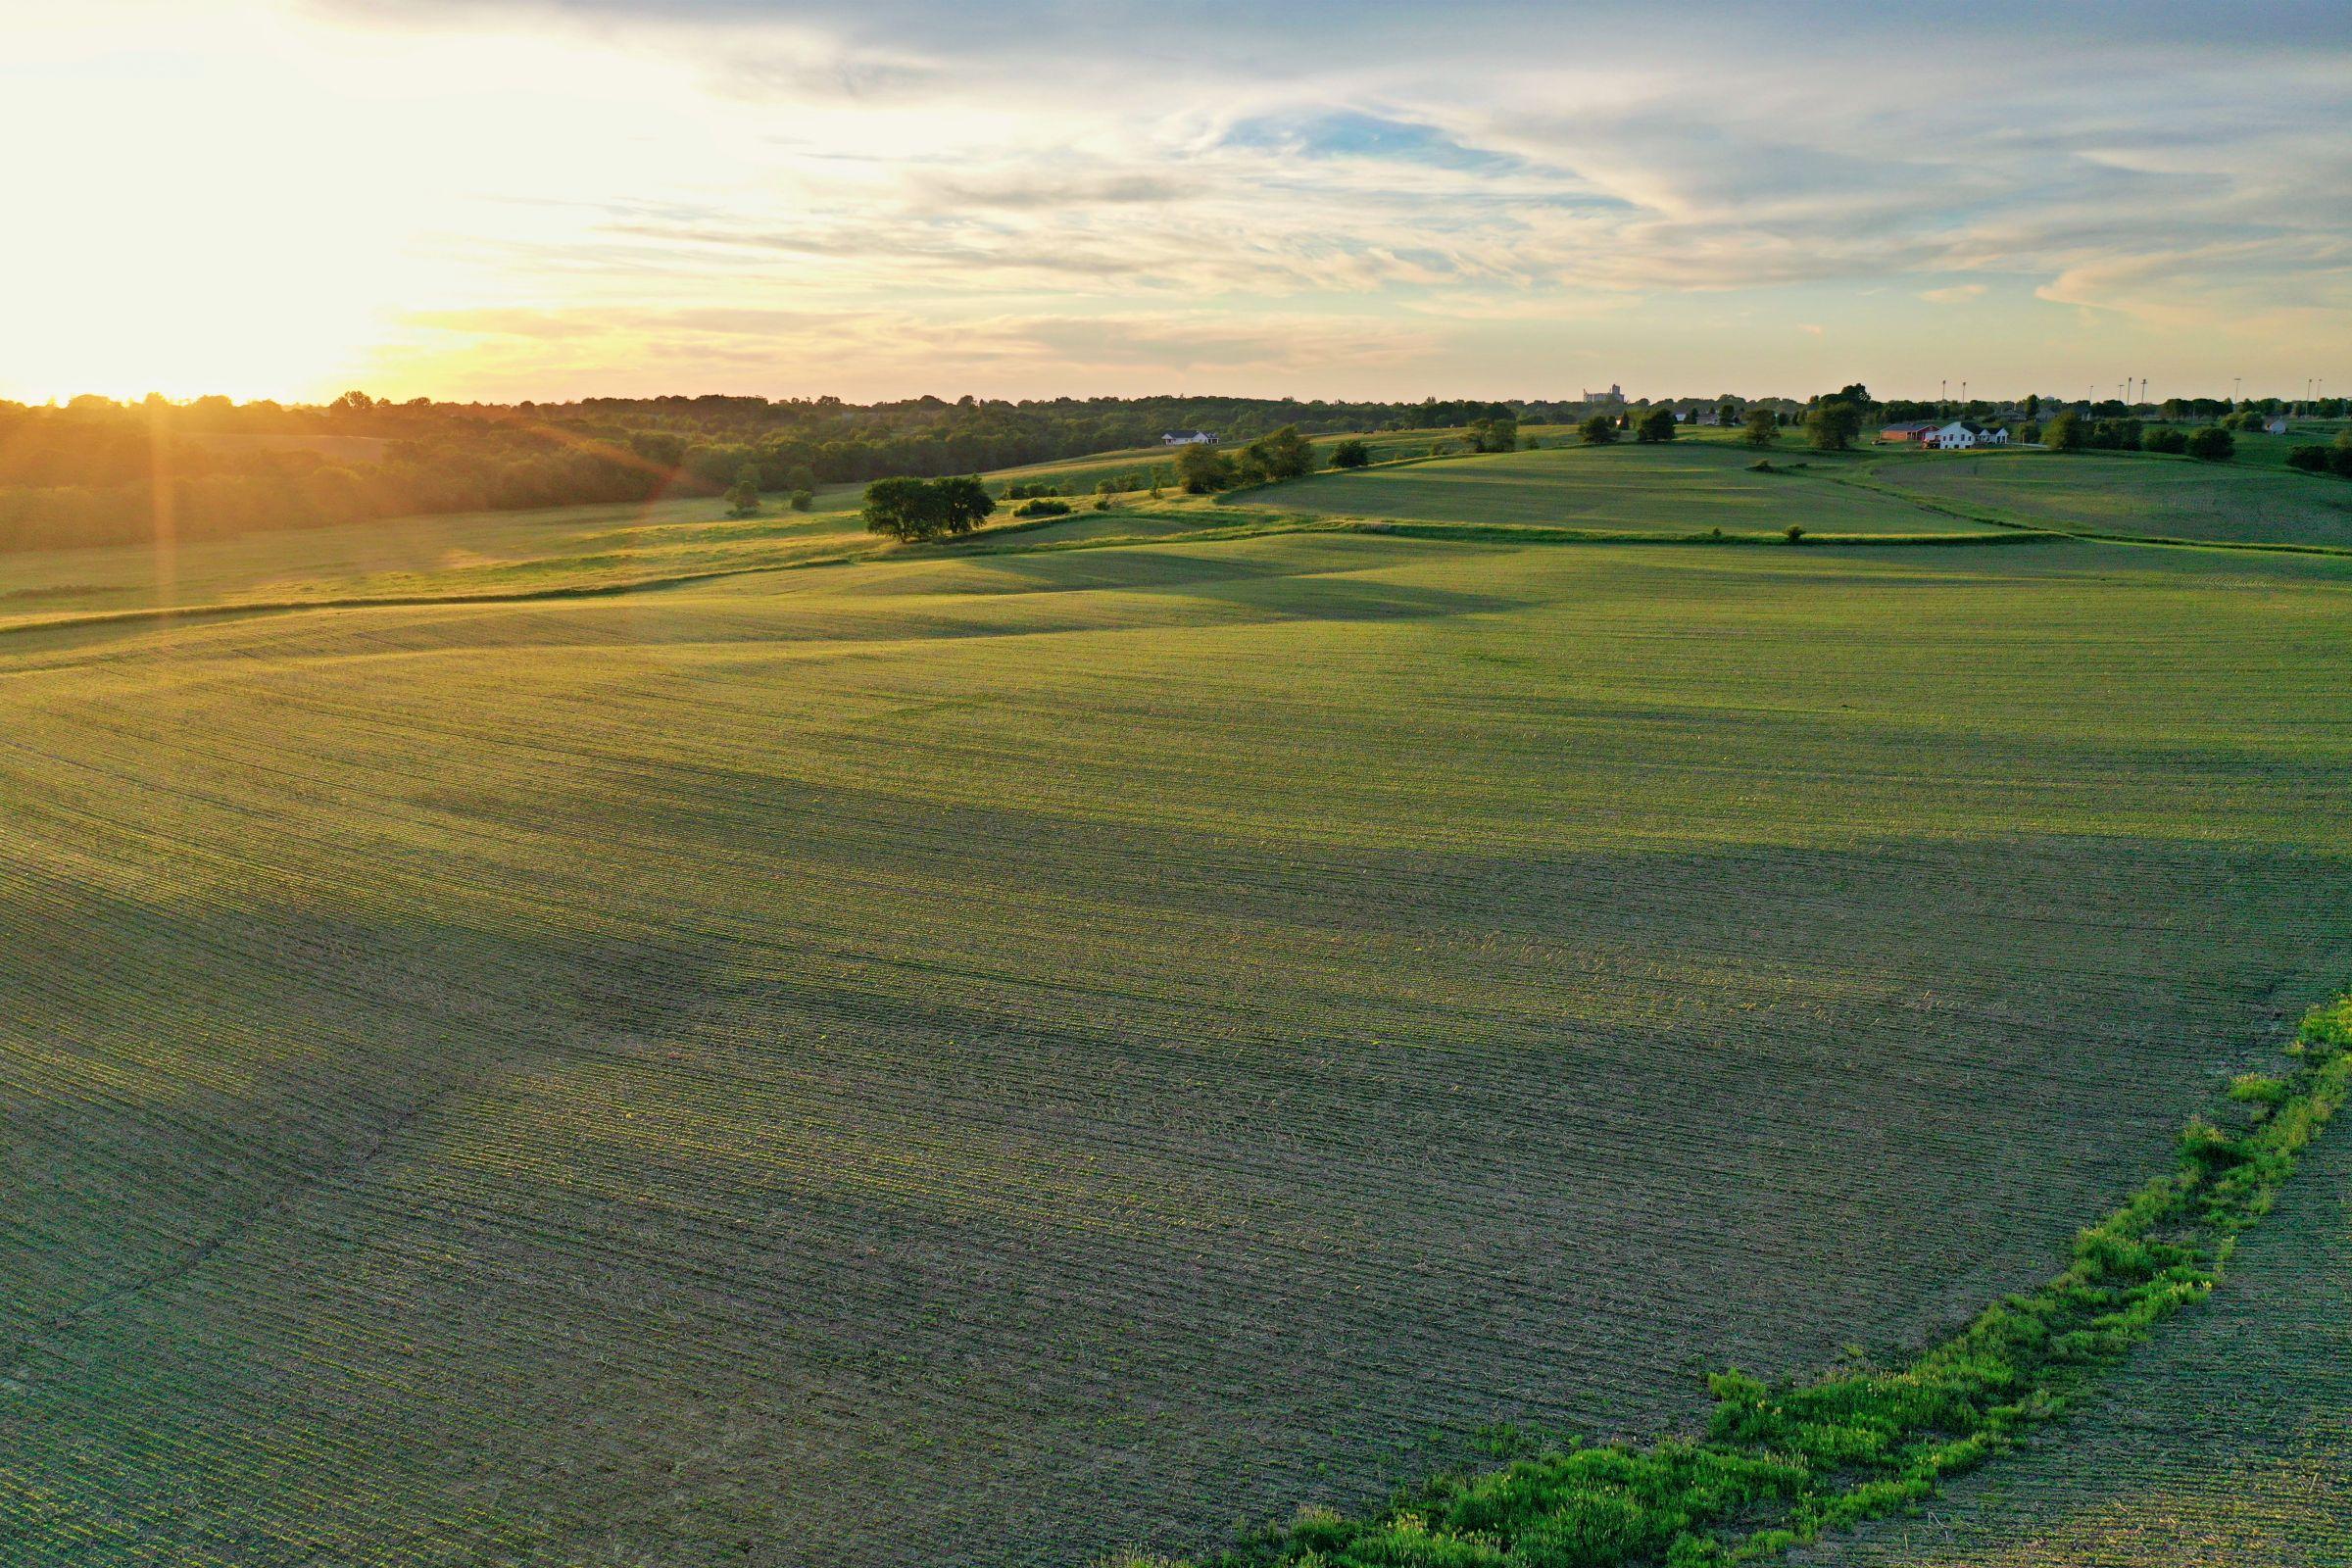 land-warren-county-iowa-20-acres-listing-number-15426-1-2021-03-24-190157.JPG